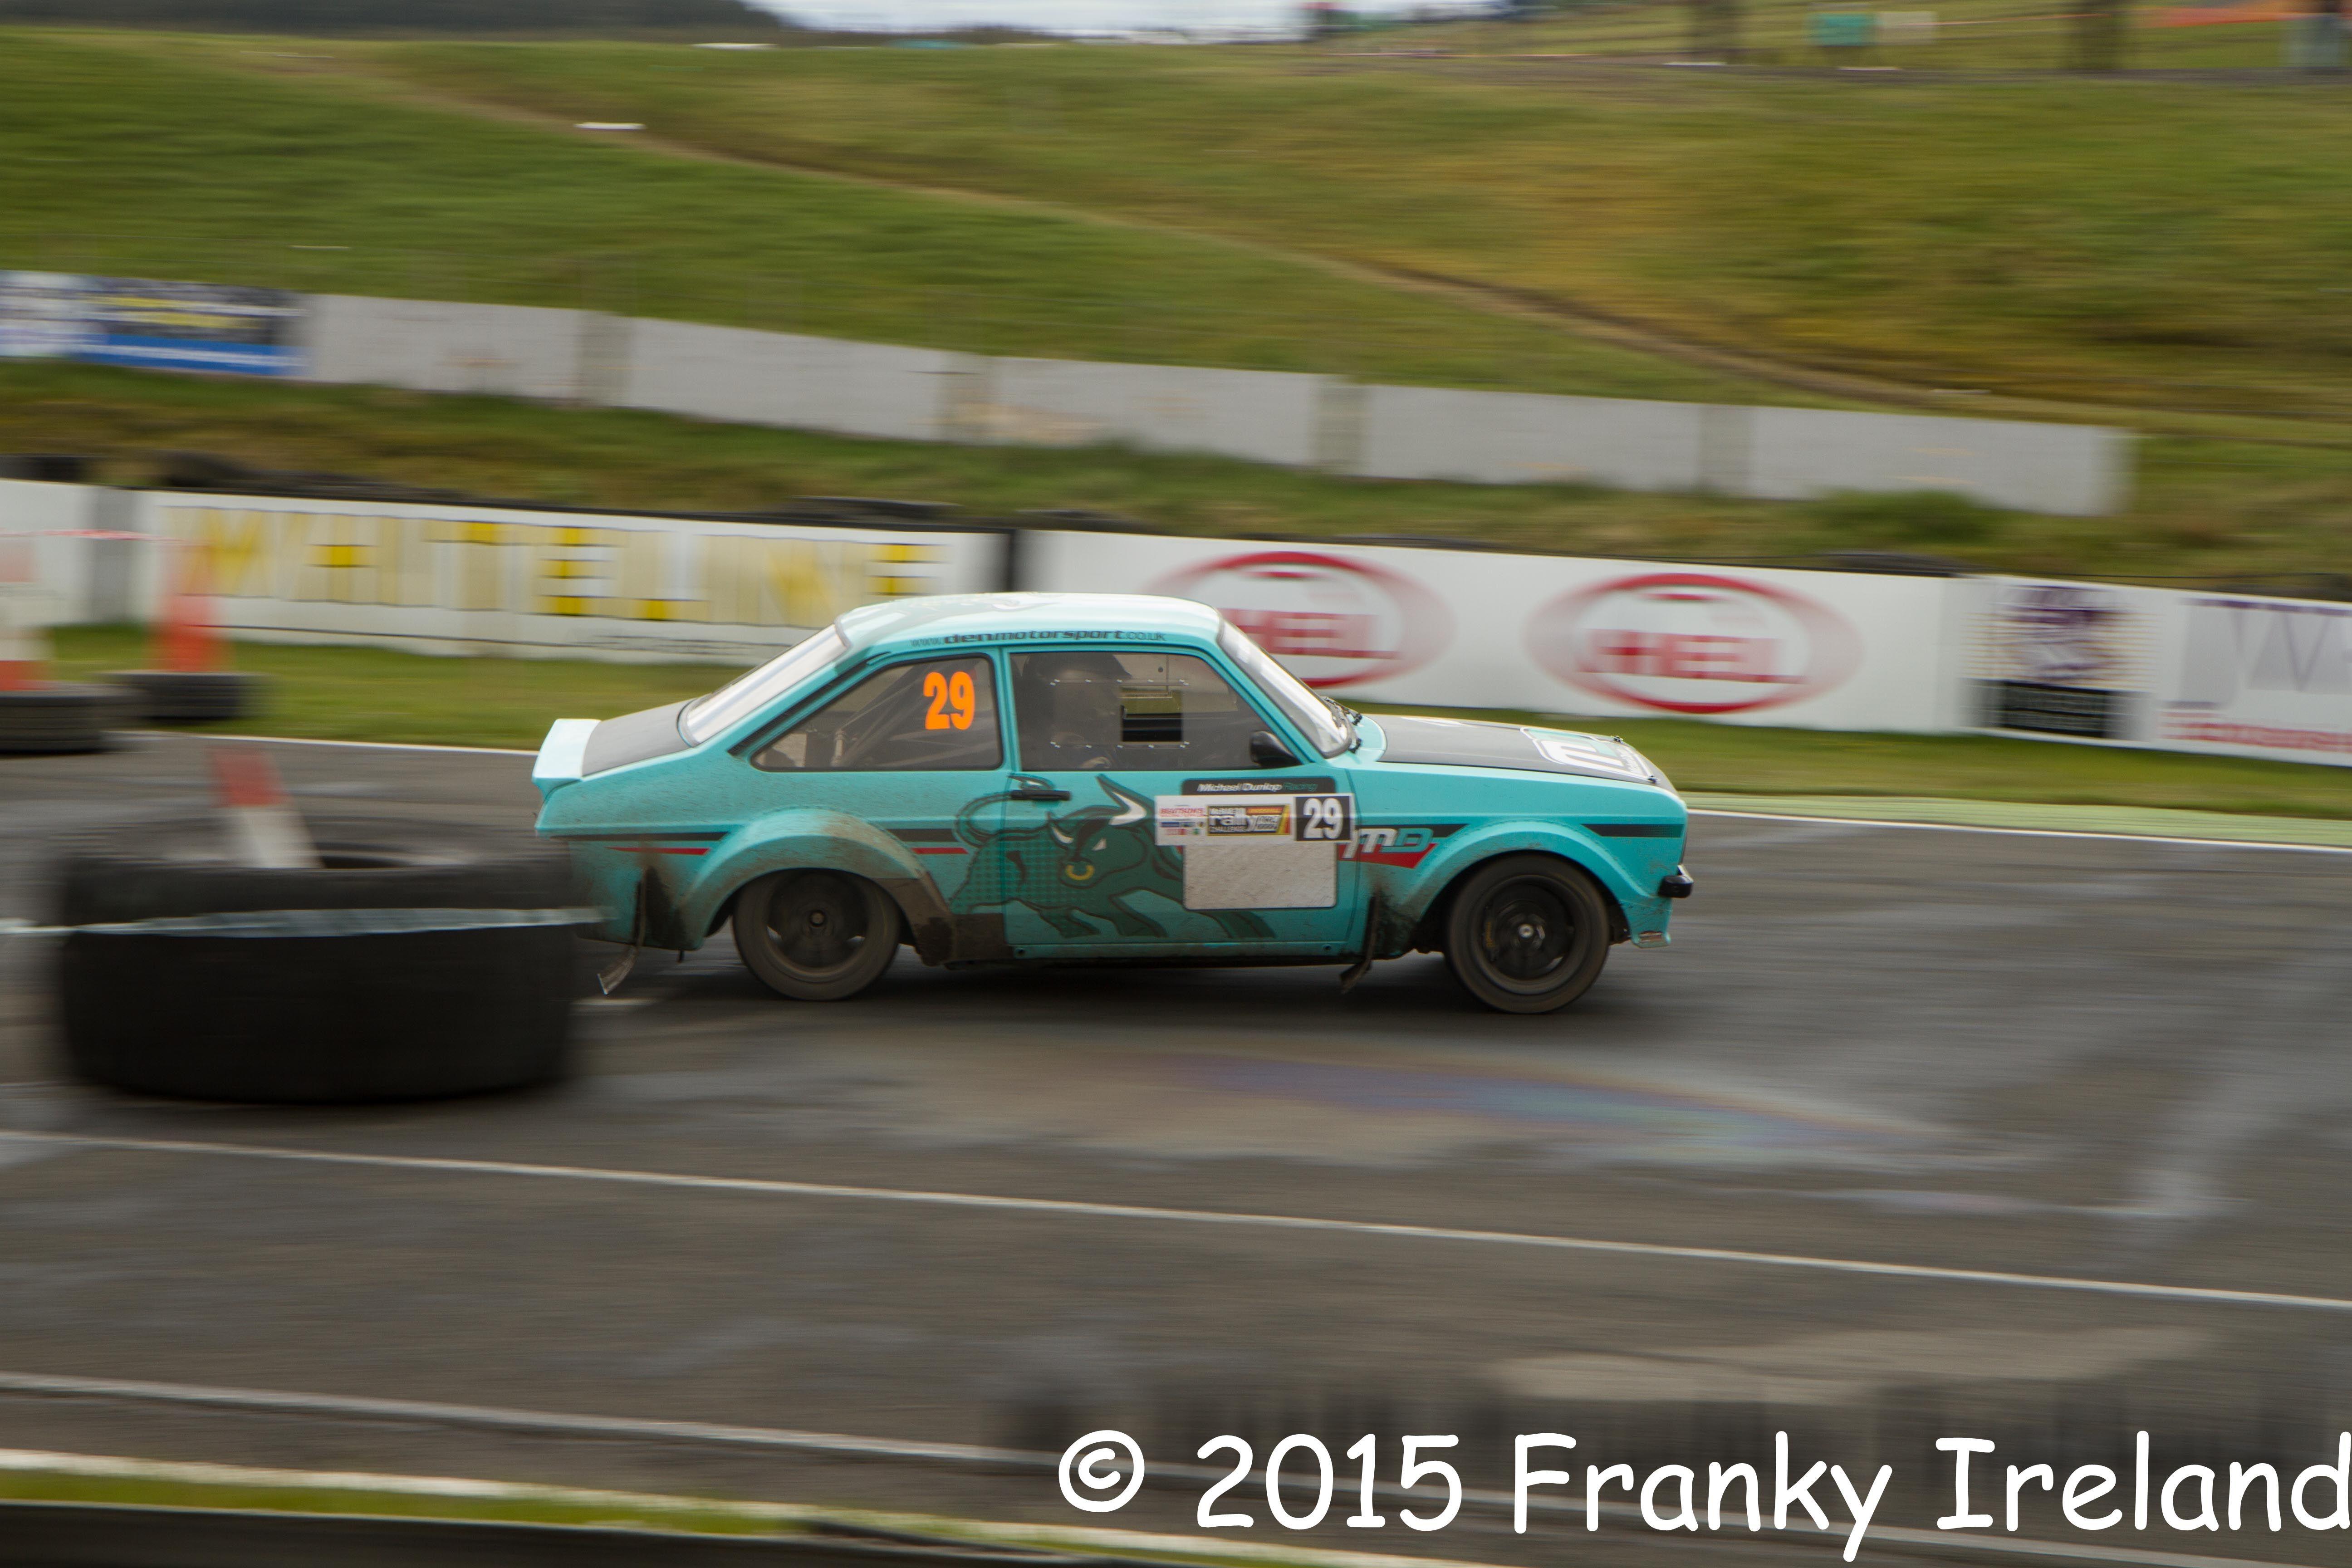 #ColinMcRae #KnockhillRacingCircuit #2015 #RallyCars